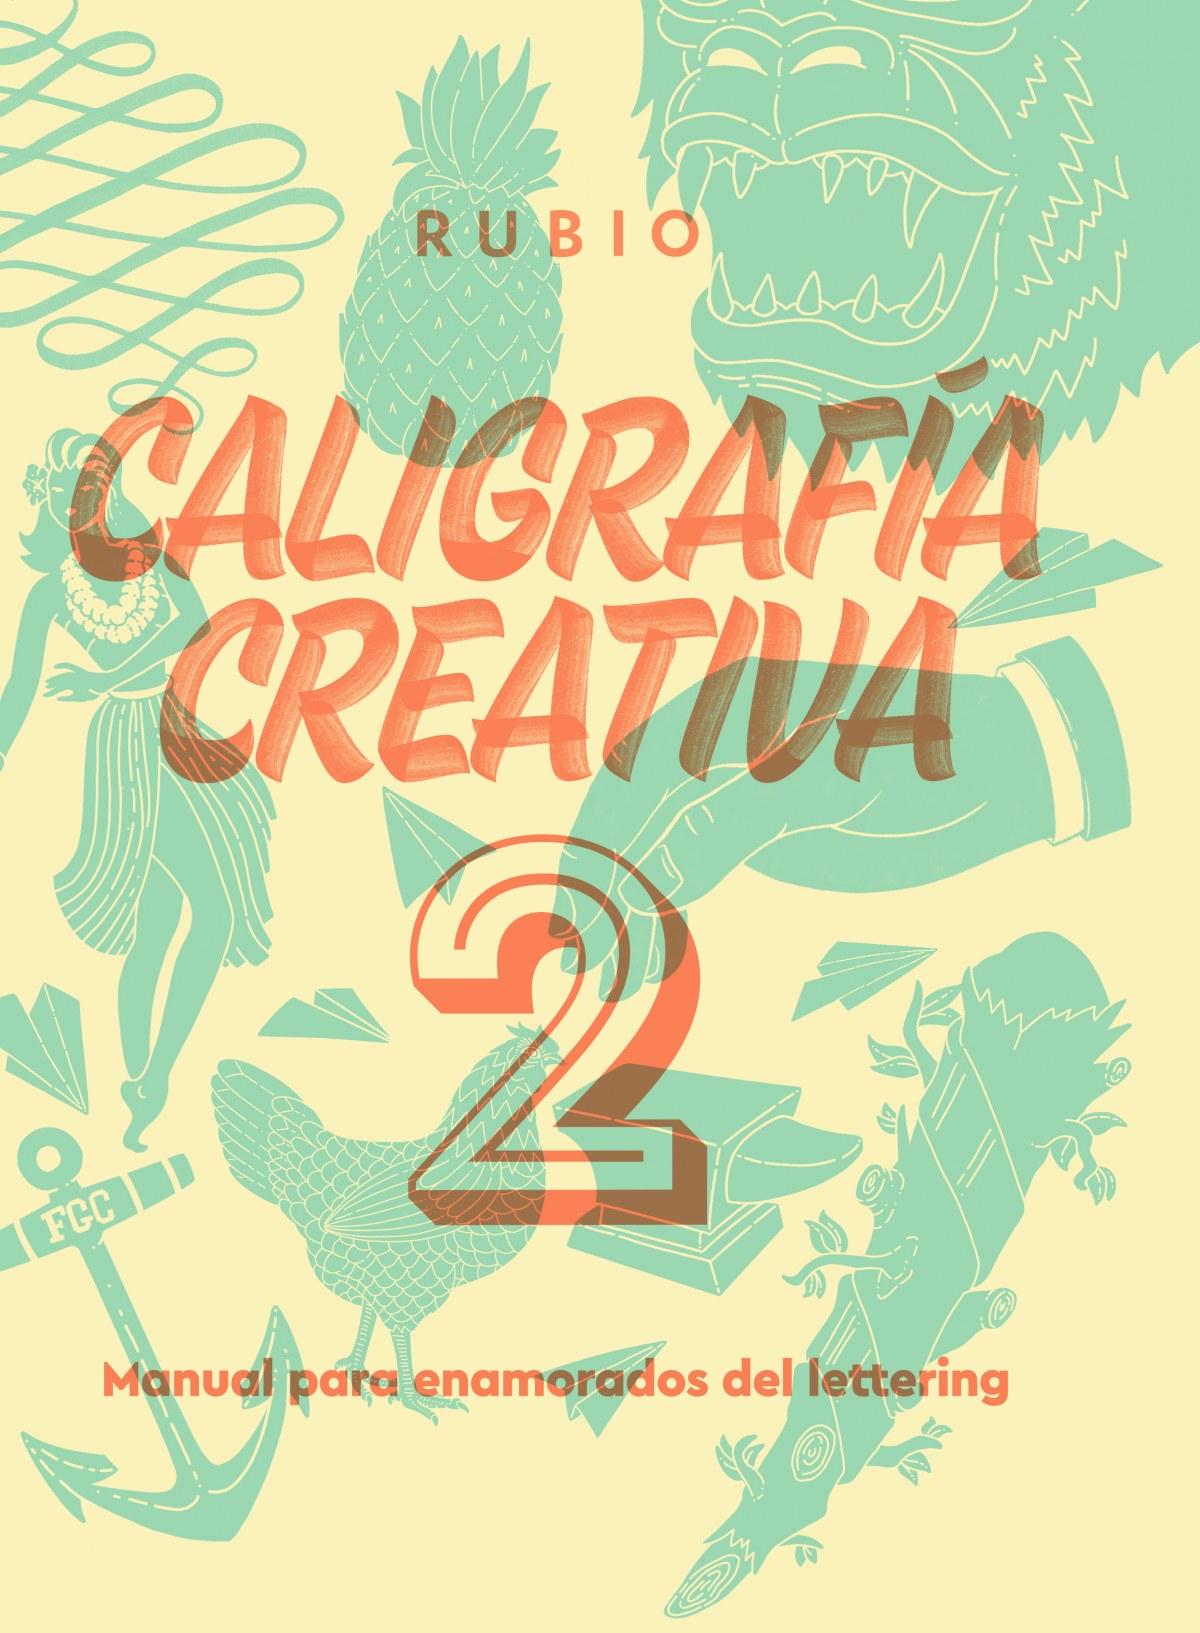 CALIGRAFÍA CREATIVA 9788417427122